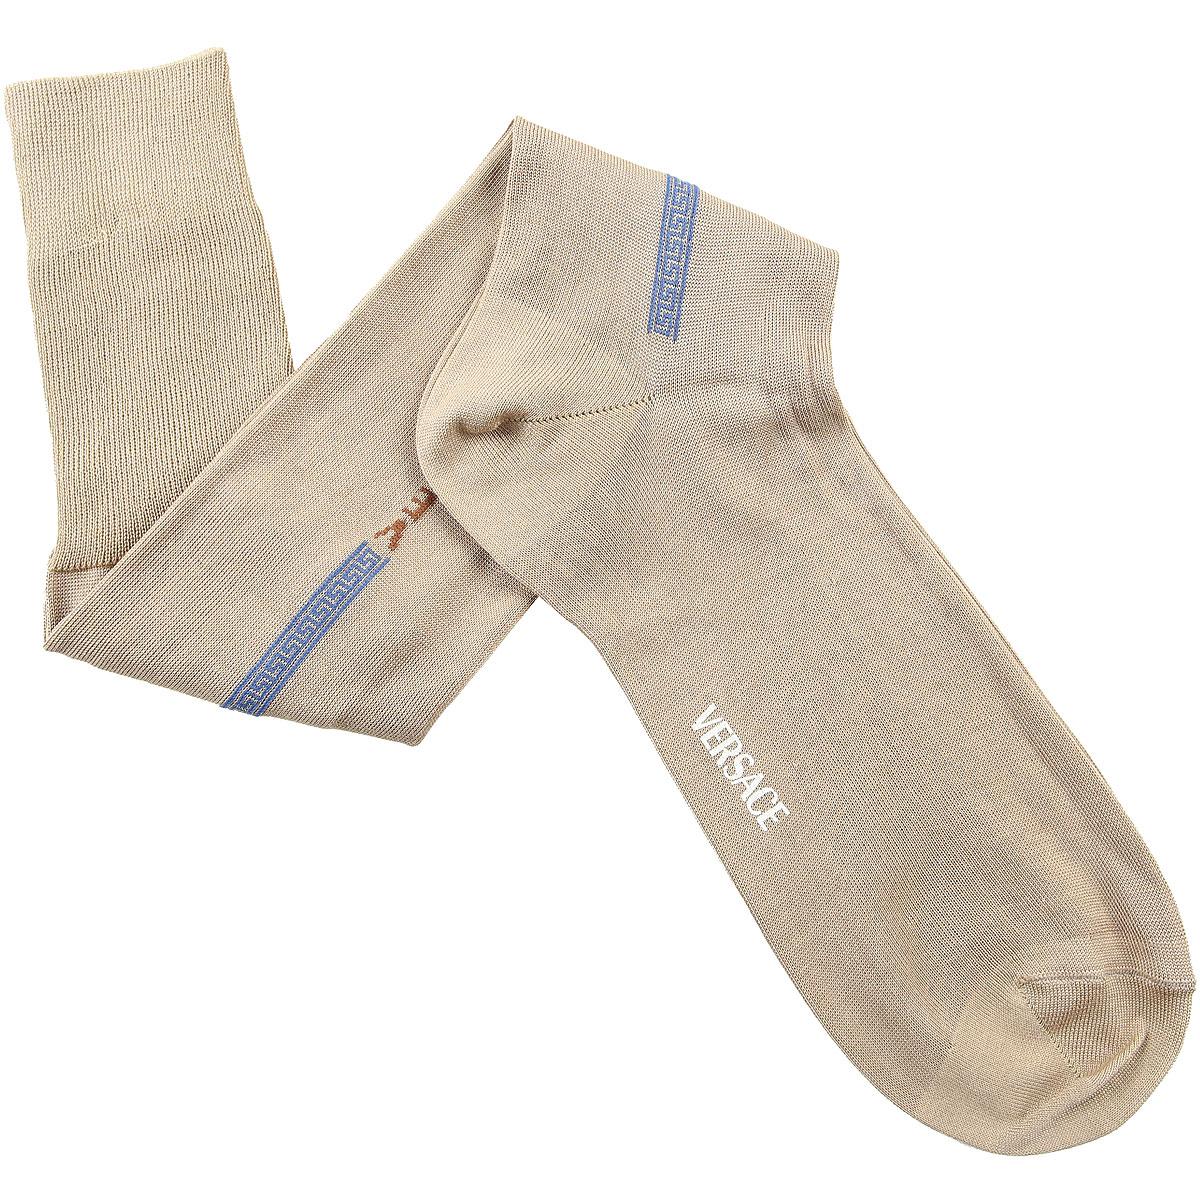 Versace Socks Socks for Men On Sale in Outlet, Beige, Lisle Cotton Thread, 2019, 12 (Shoe Size: EU 44 - US 10) 12.5 (Shoe Size: EU 44.5 - US